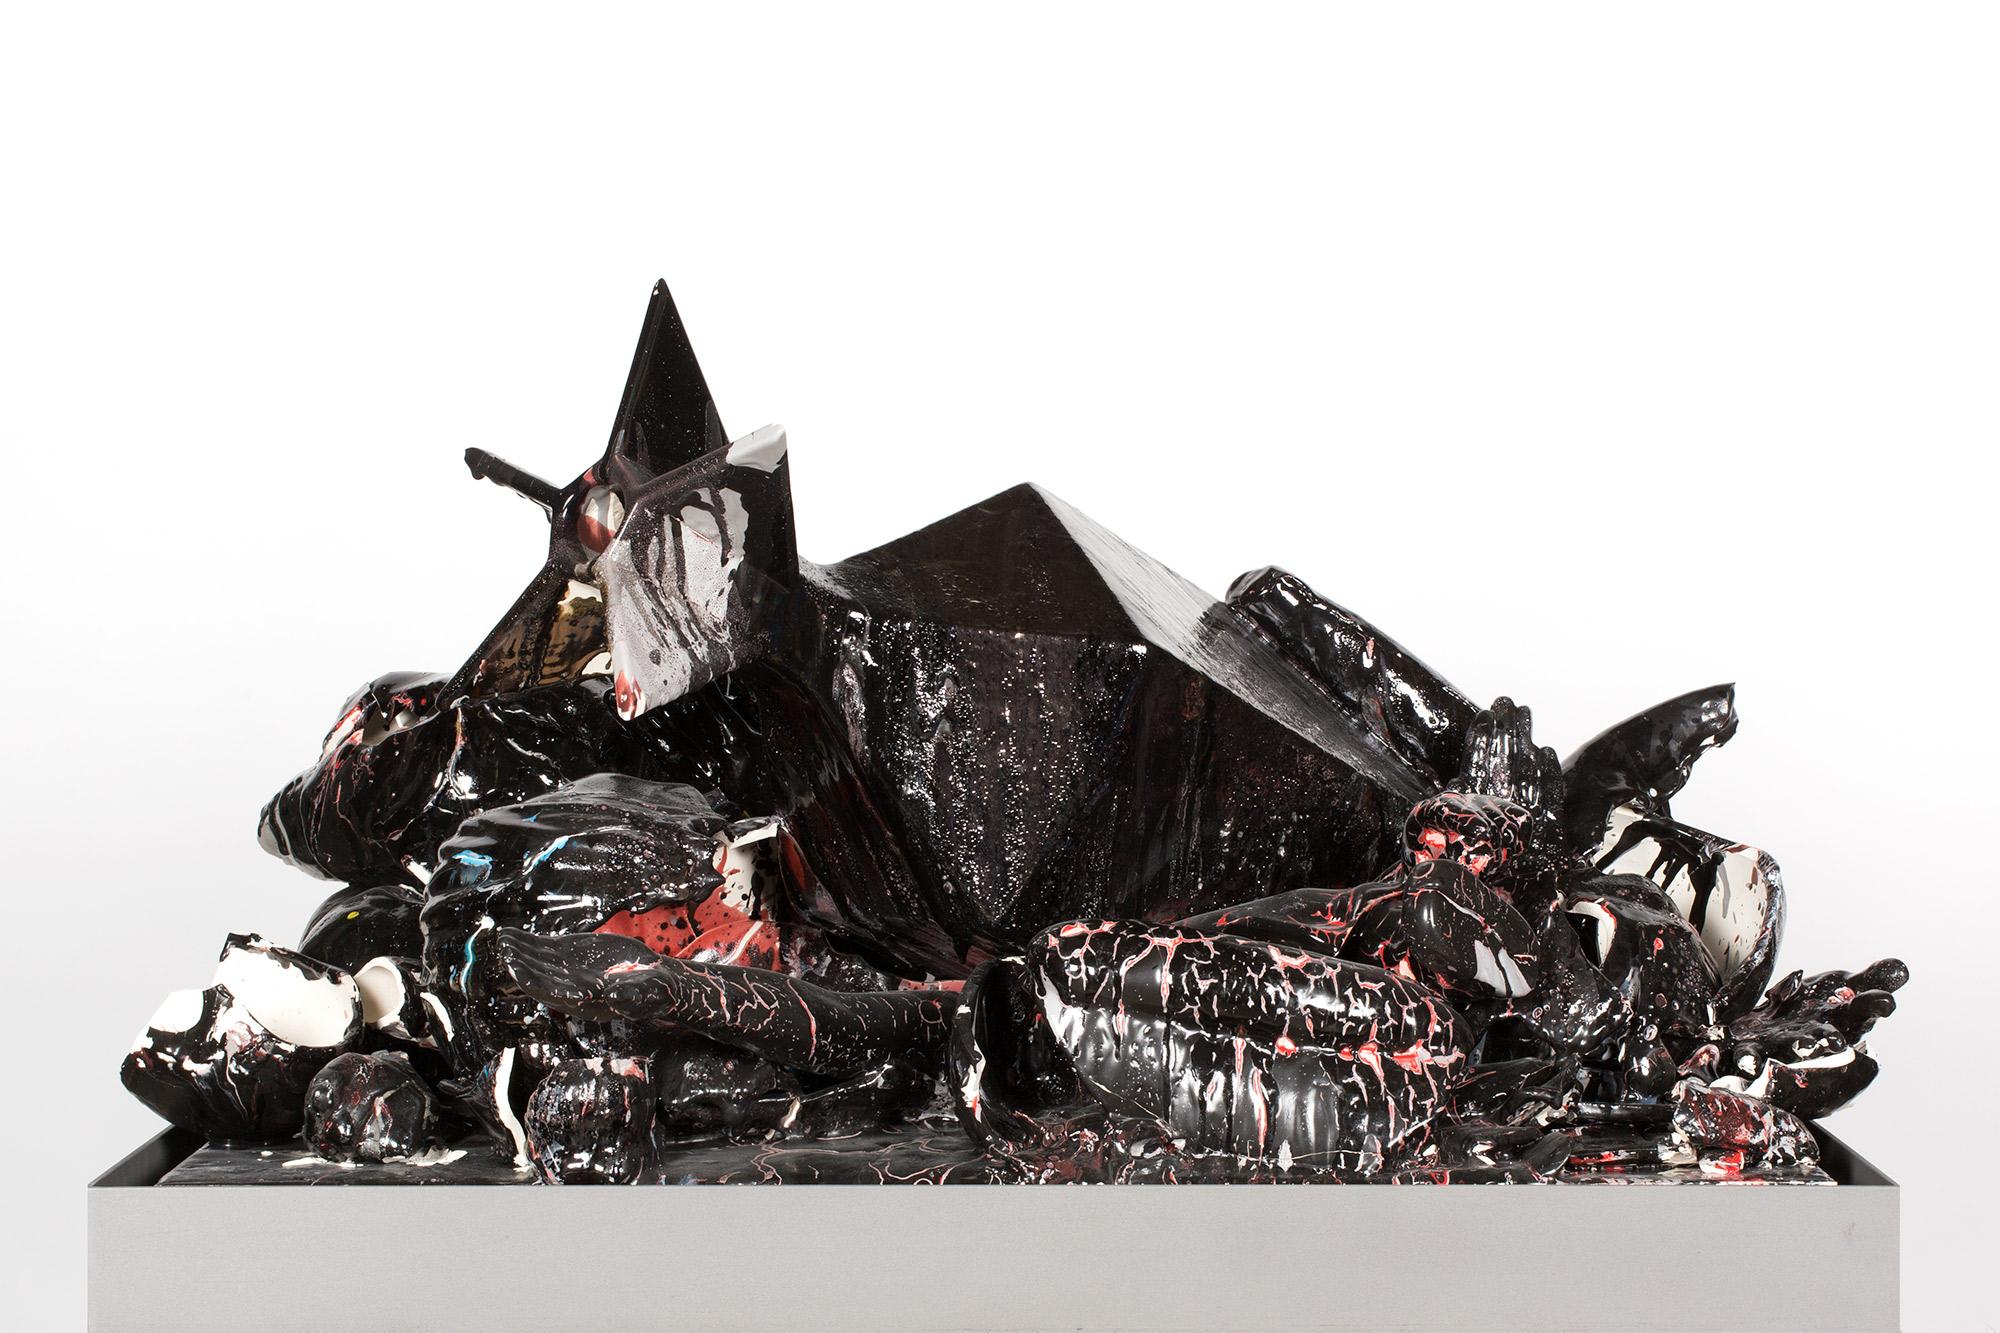 La Religiosidad Americana (February 17–March 1, 2015: Cerámica Suro Contemporánea, Guadalajara, Jalisco, Mexico)    2015   Ceramica Suro slip cast remnants, glaze, and firing plate  55 1/2 x 42 x 26 1/2 inches   Ceramics, 2013–